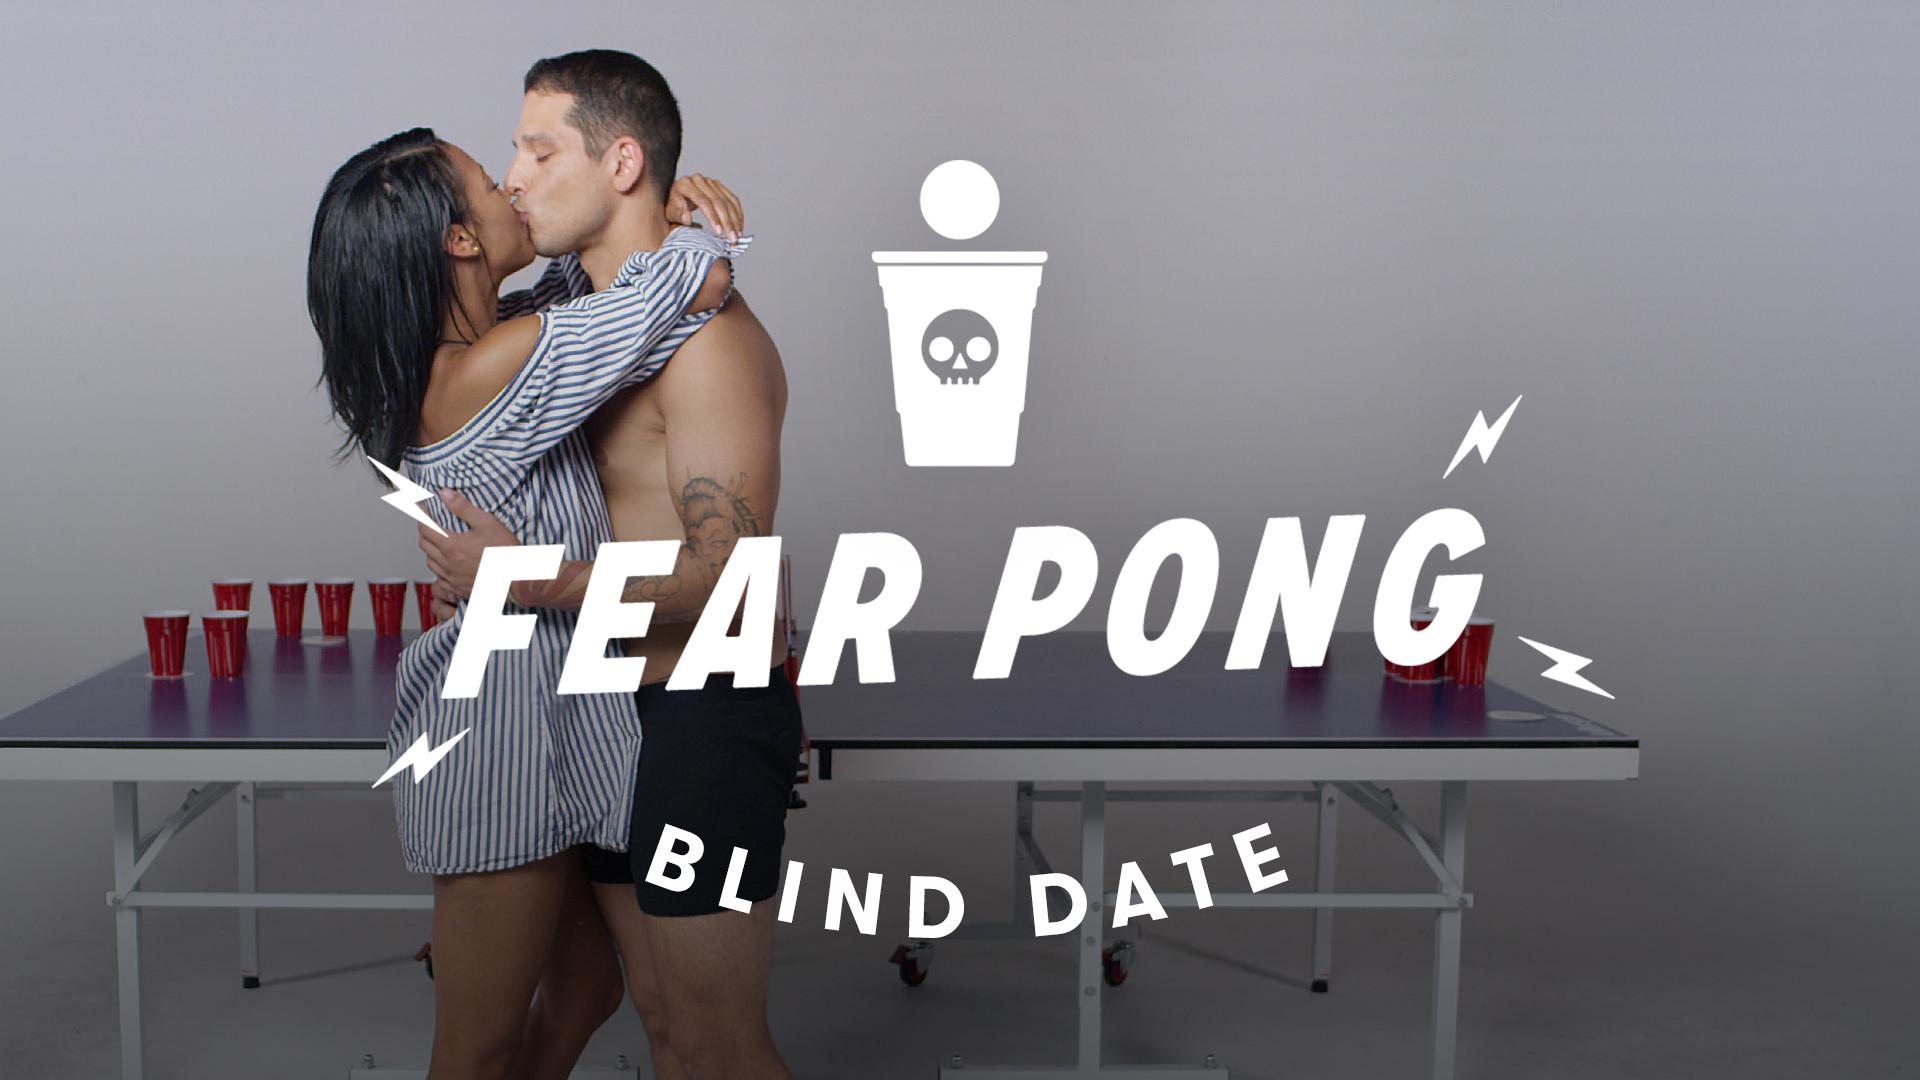 Blind Dates Fear Pong – Ella vs. Carlos - 👁 12.8 MM | 👍 128K | 💬 5.7K